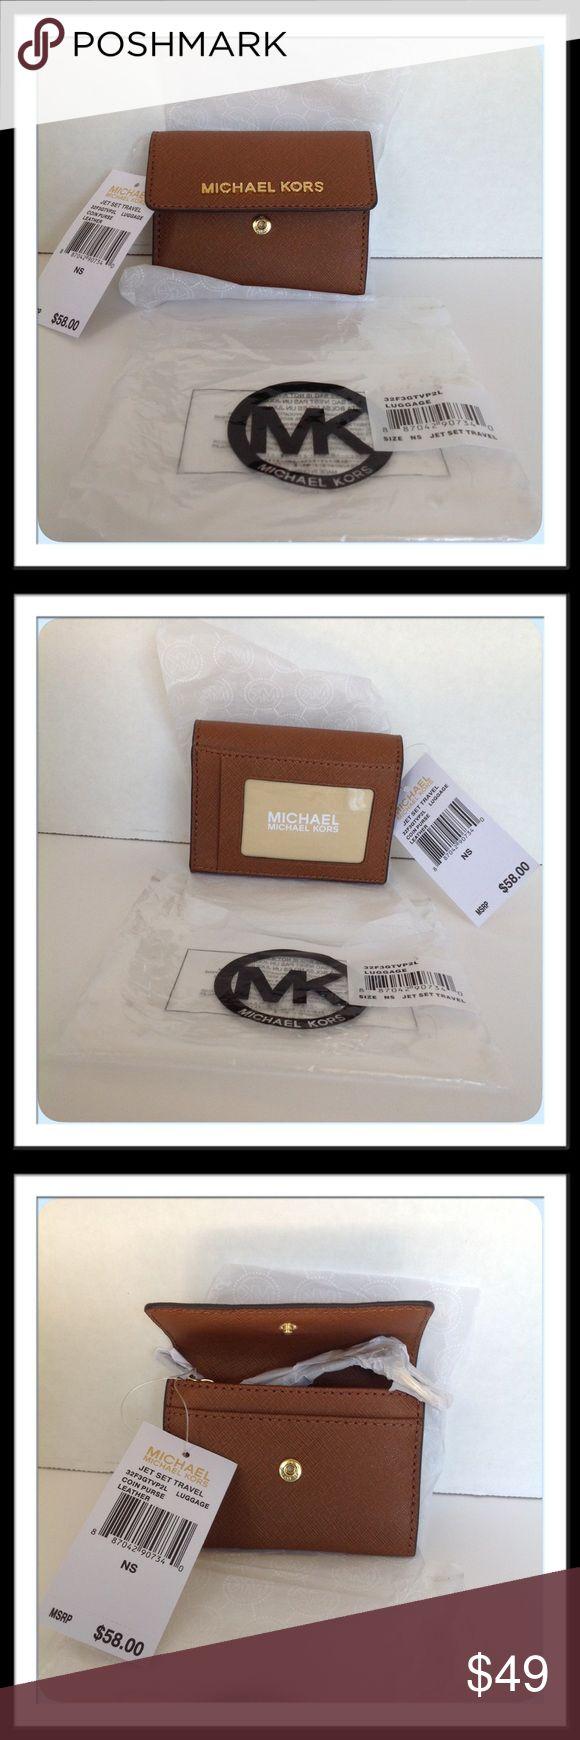 Spotted while shopping on Poshmark: MICHAEL Michael Kors Jet Set Leather Coin Purse! #poshmark #fashion #shopping #style #MICHAEL Michael Kors #Handbags